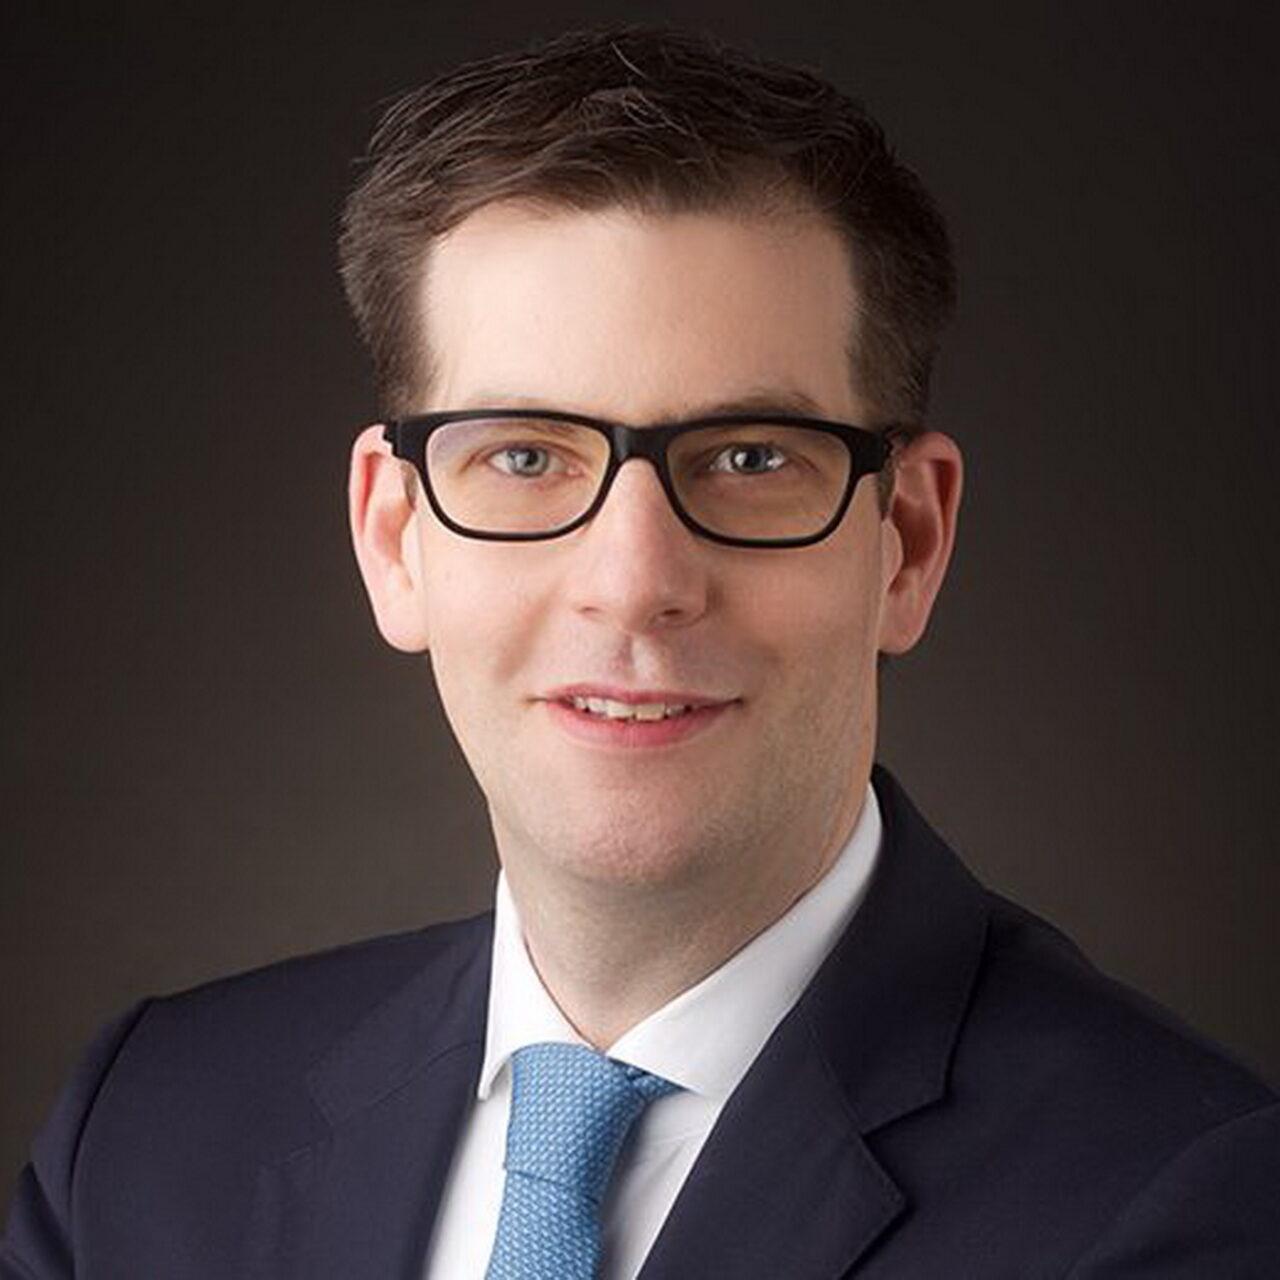 Private Equity-Experte wechselt zurUBS